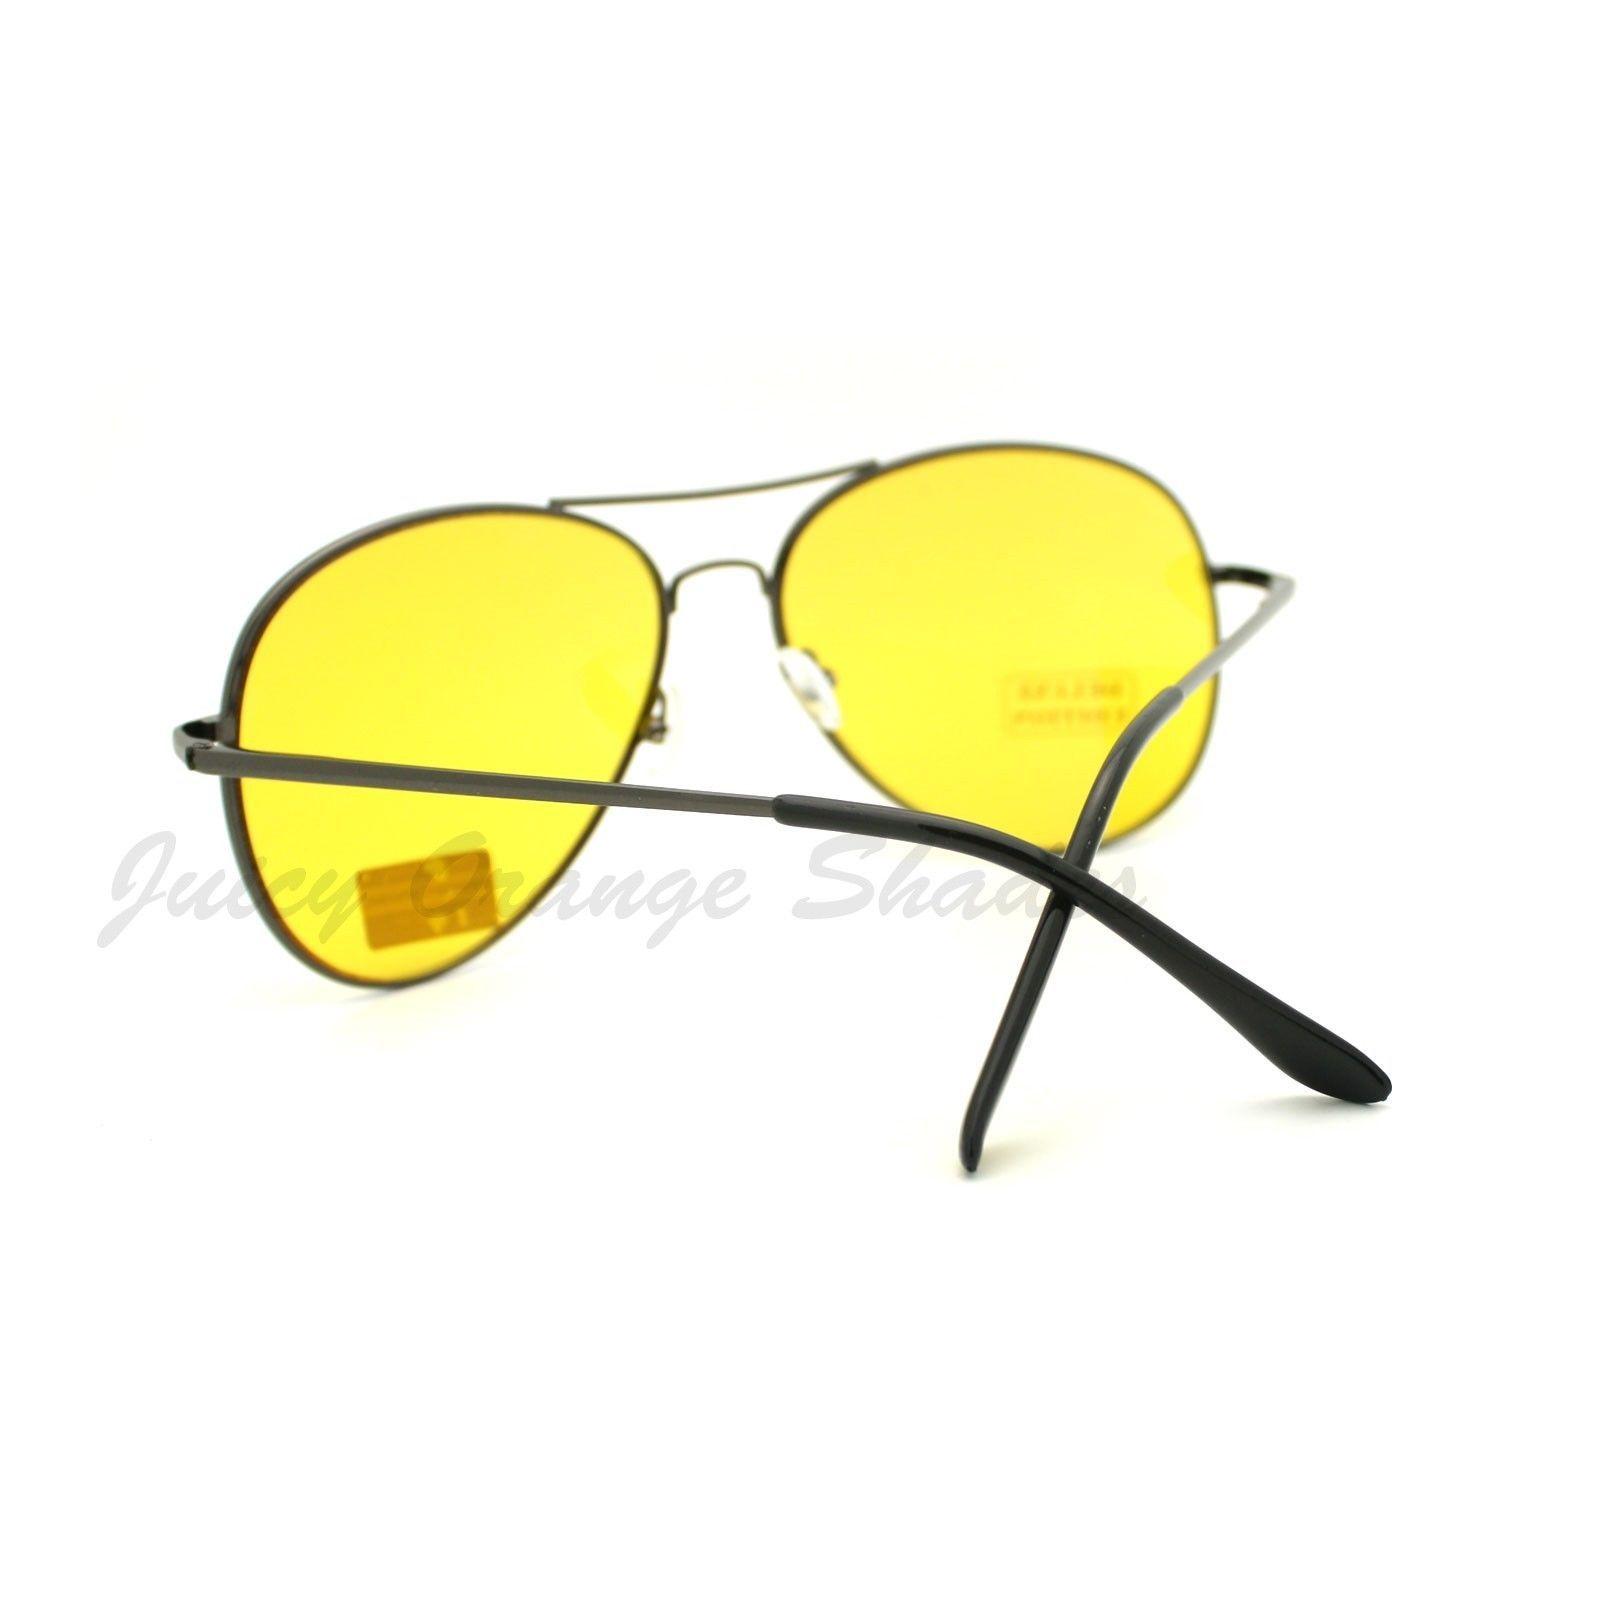 Yellow Lens Foggy Weather Round Aviator Sunglasses UV 400